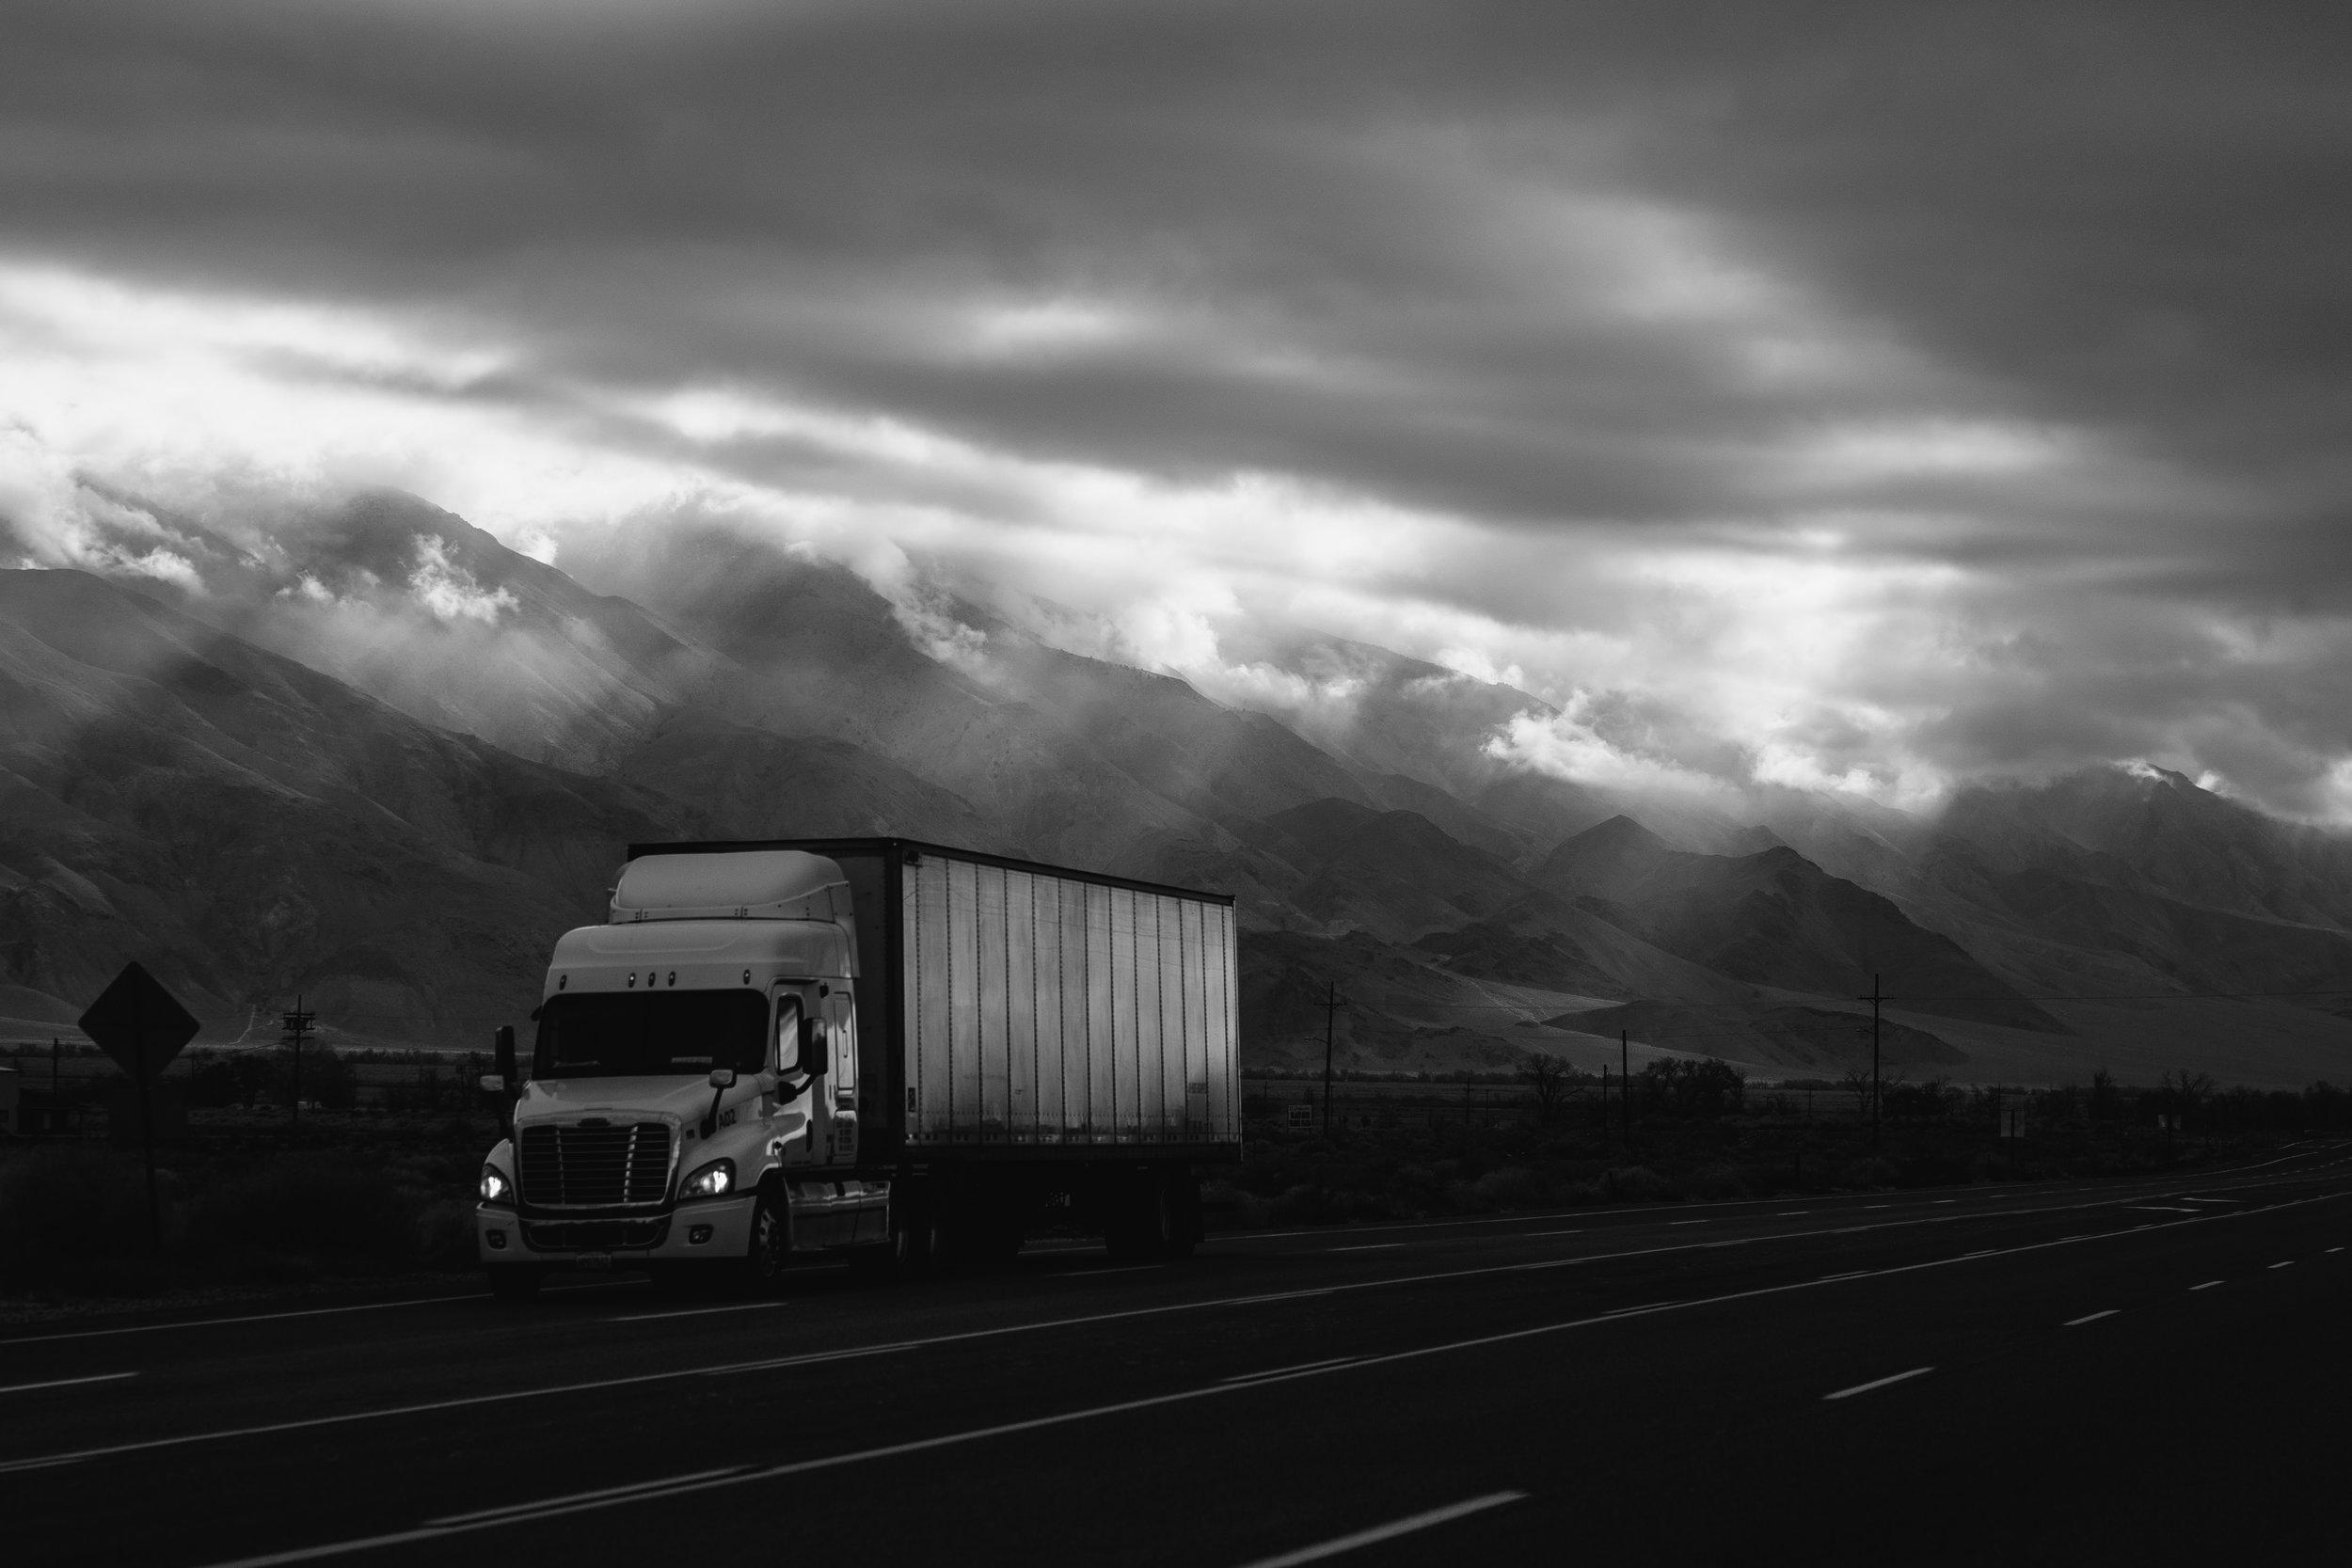 IOT for Fleet Management - track your fuel usage, driving behavior, identify your fleet location